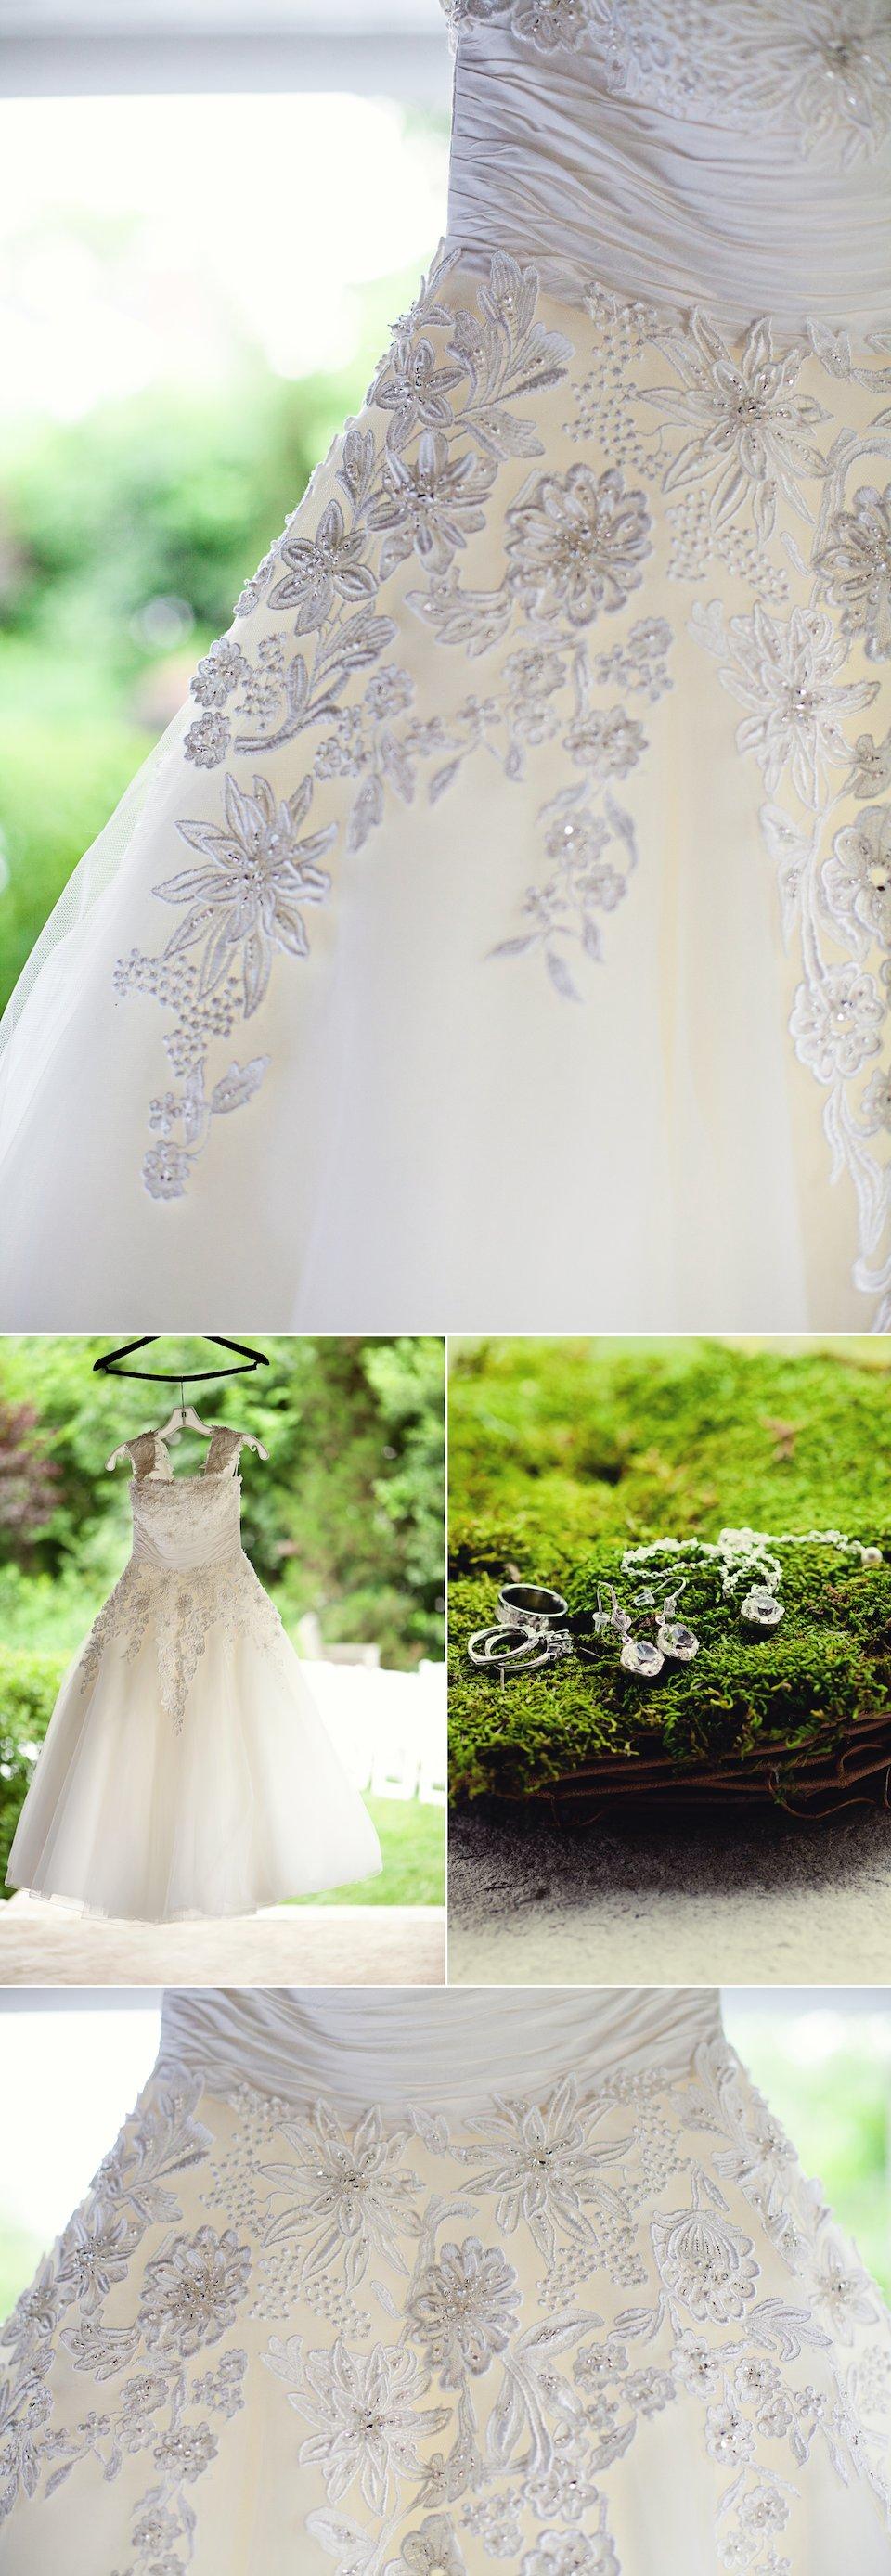 Elegant-kansas-city-wedding-brides-gown.full